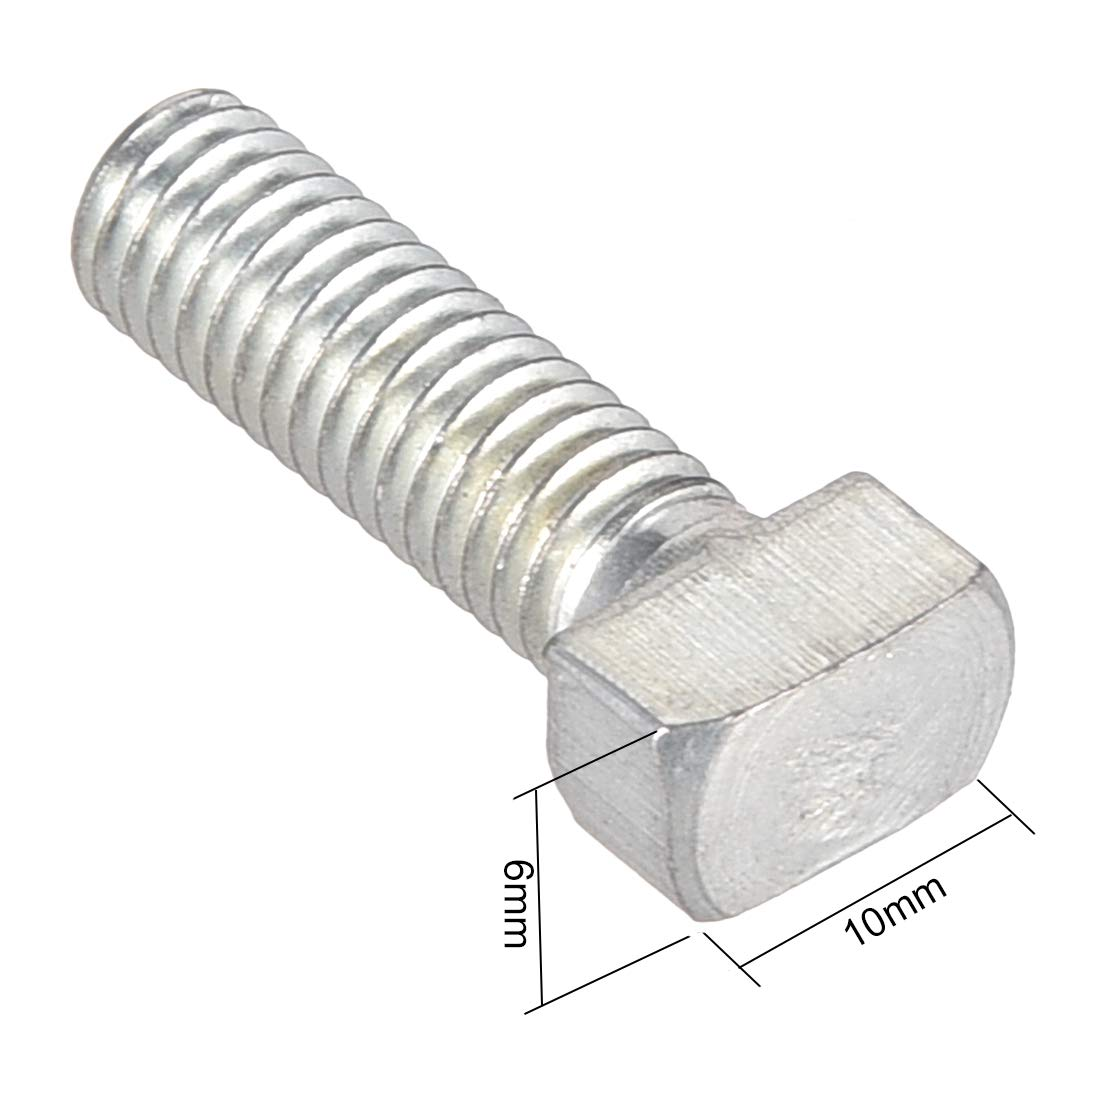 sourcing map M8 Thread 16mm T-Slot Drop-in Stud Screw Bolt Carbon Steel 40 Series 20pcs